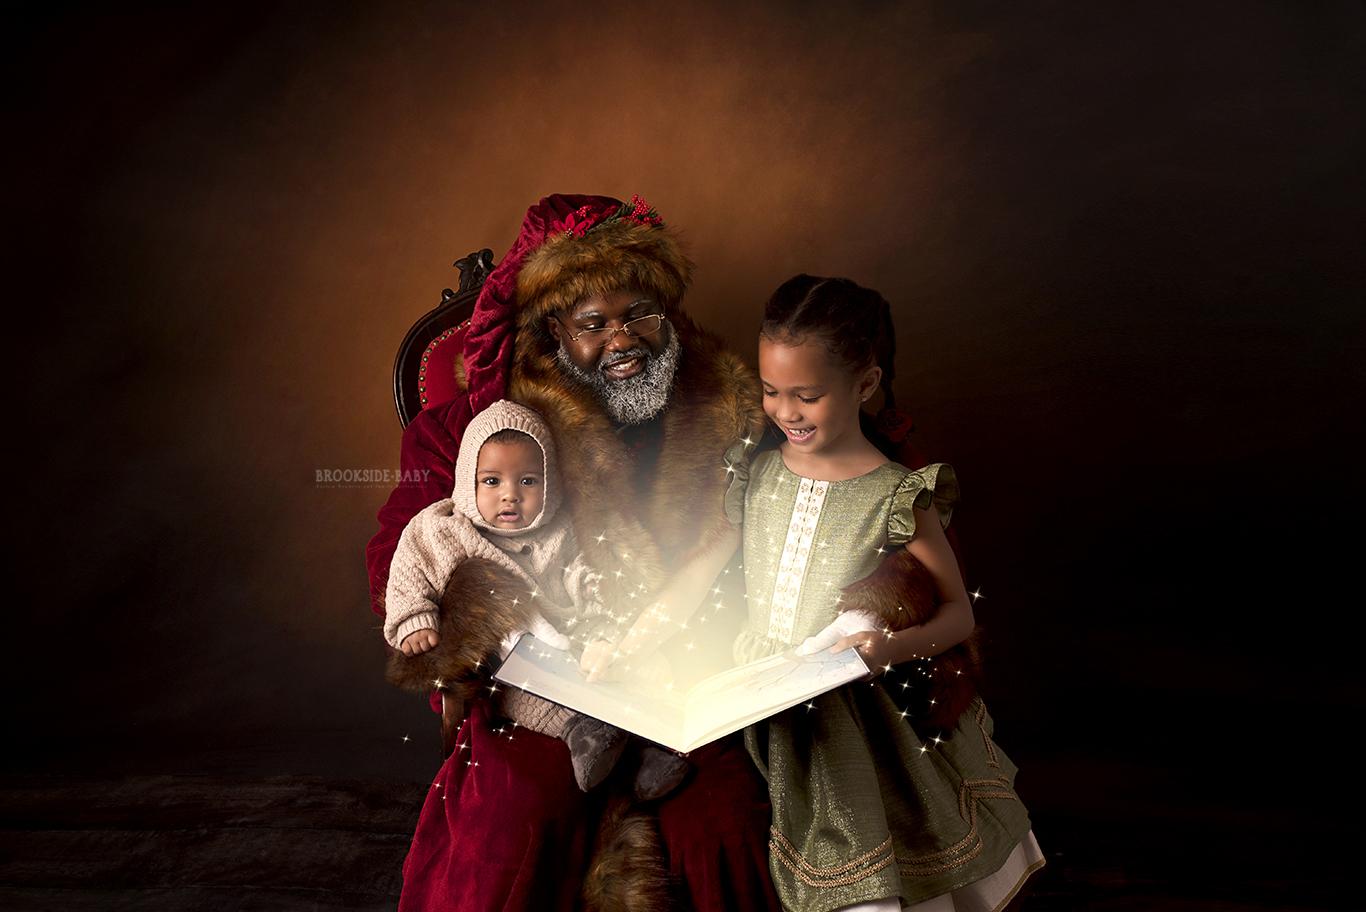 Gisela & Julian's Story With Santa Brookside Baby